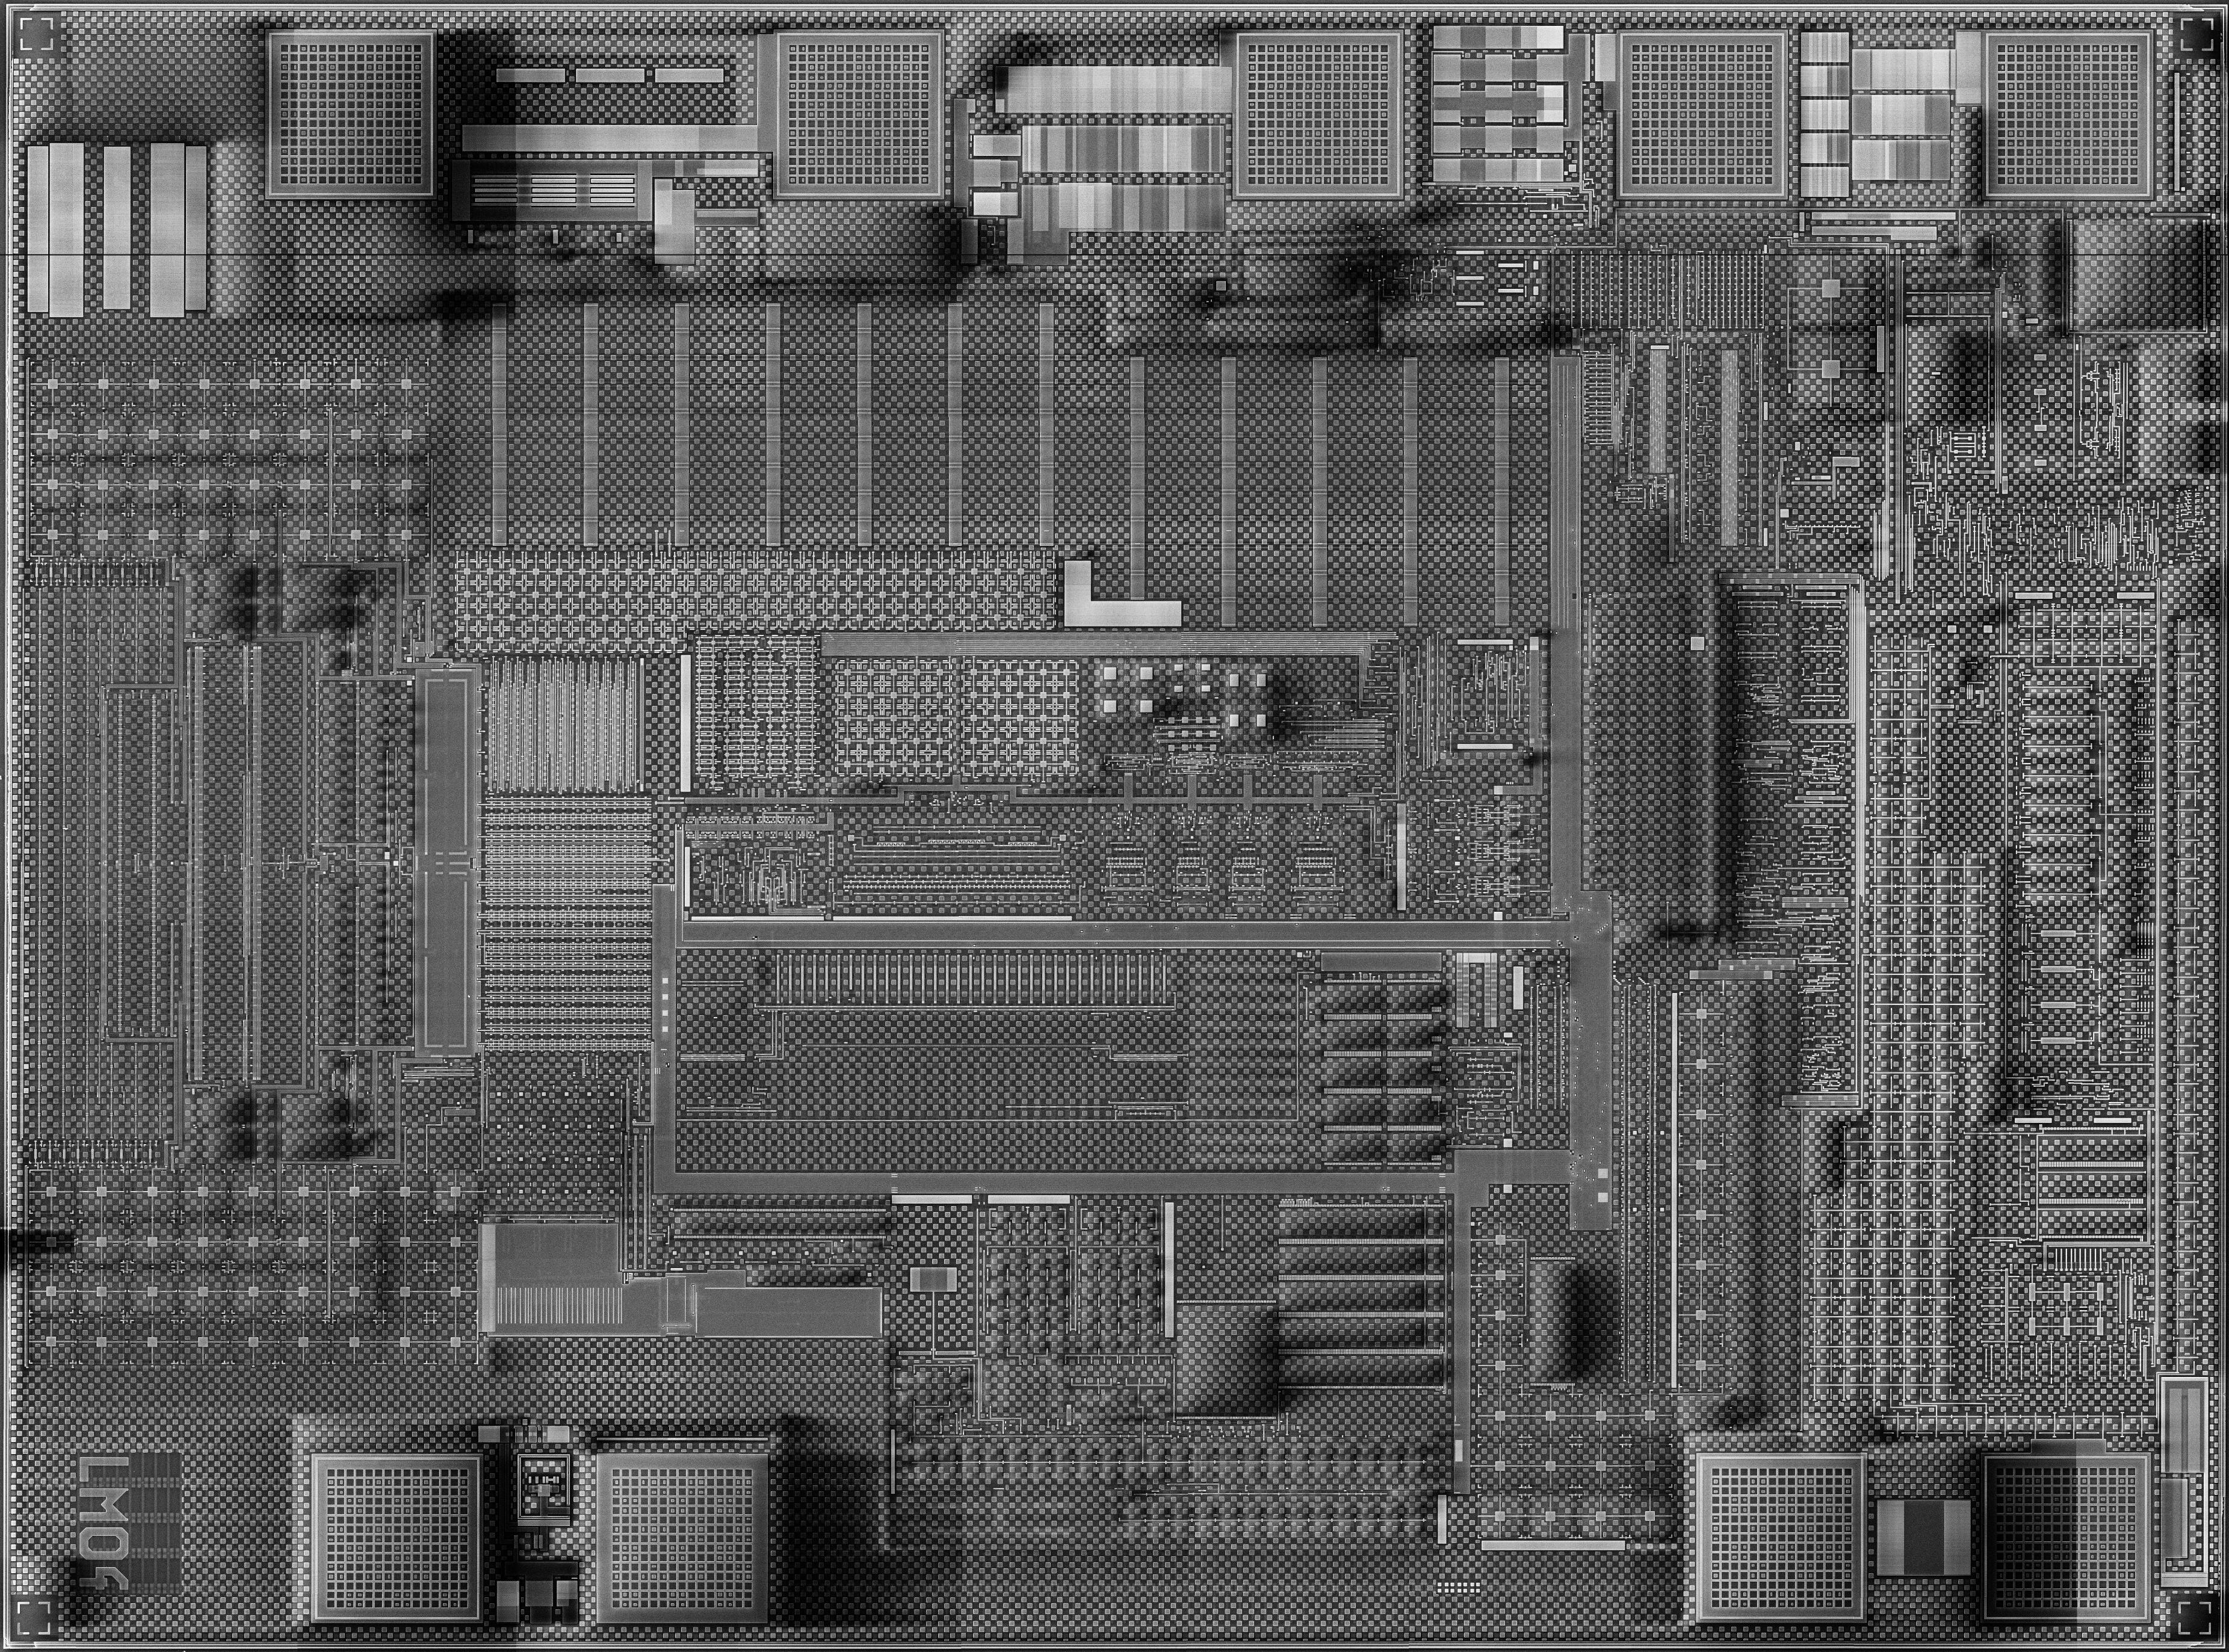 coxem-panorma-microelectronic